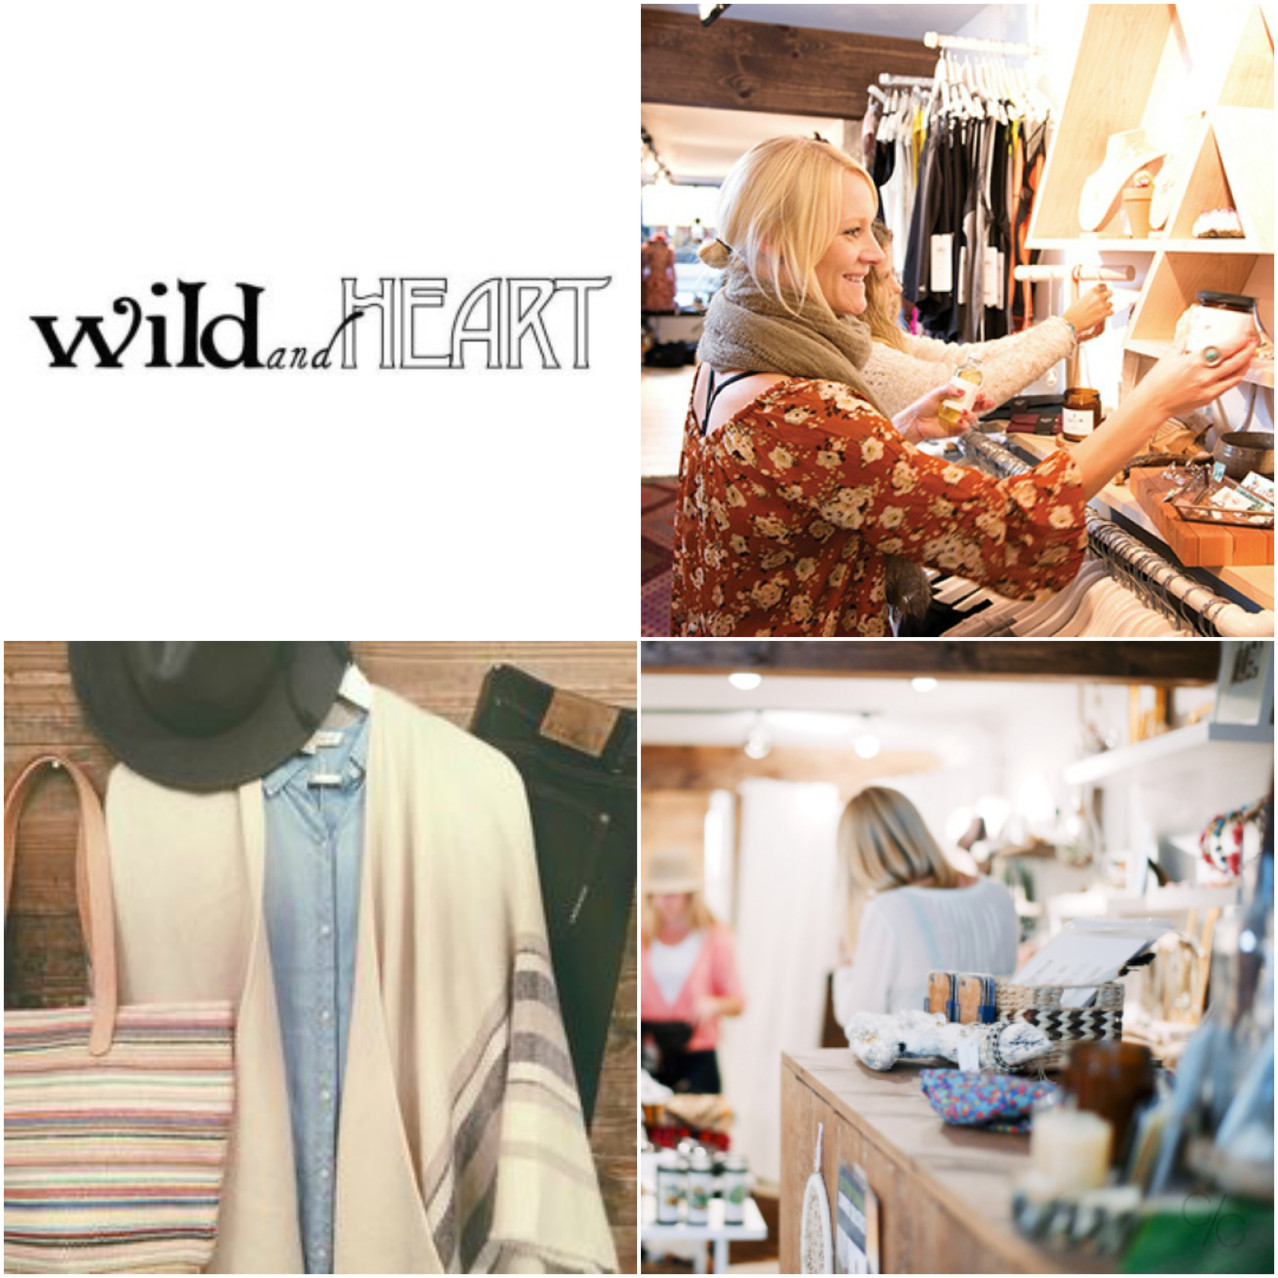 wildandheart2